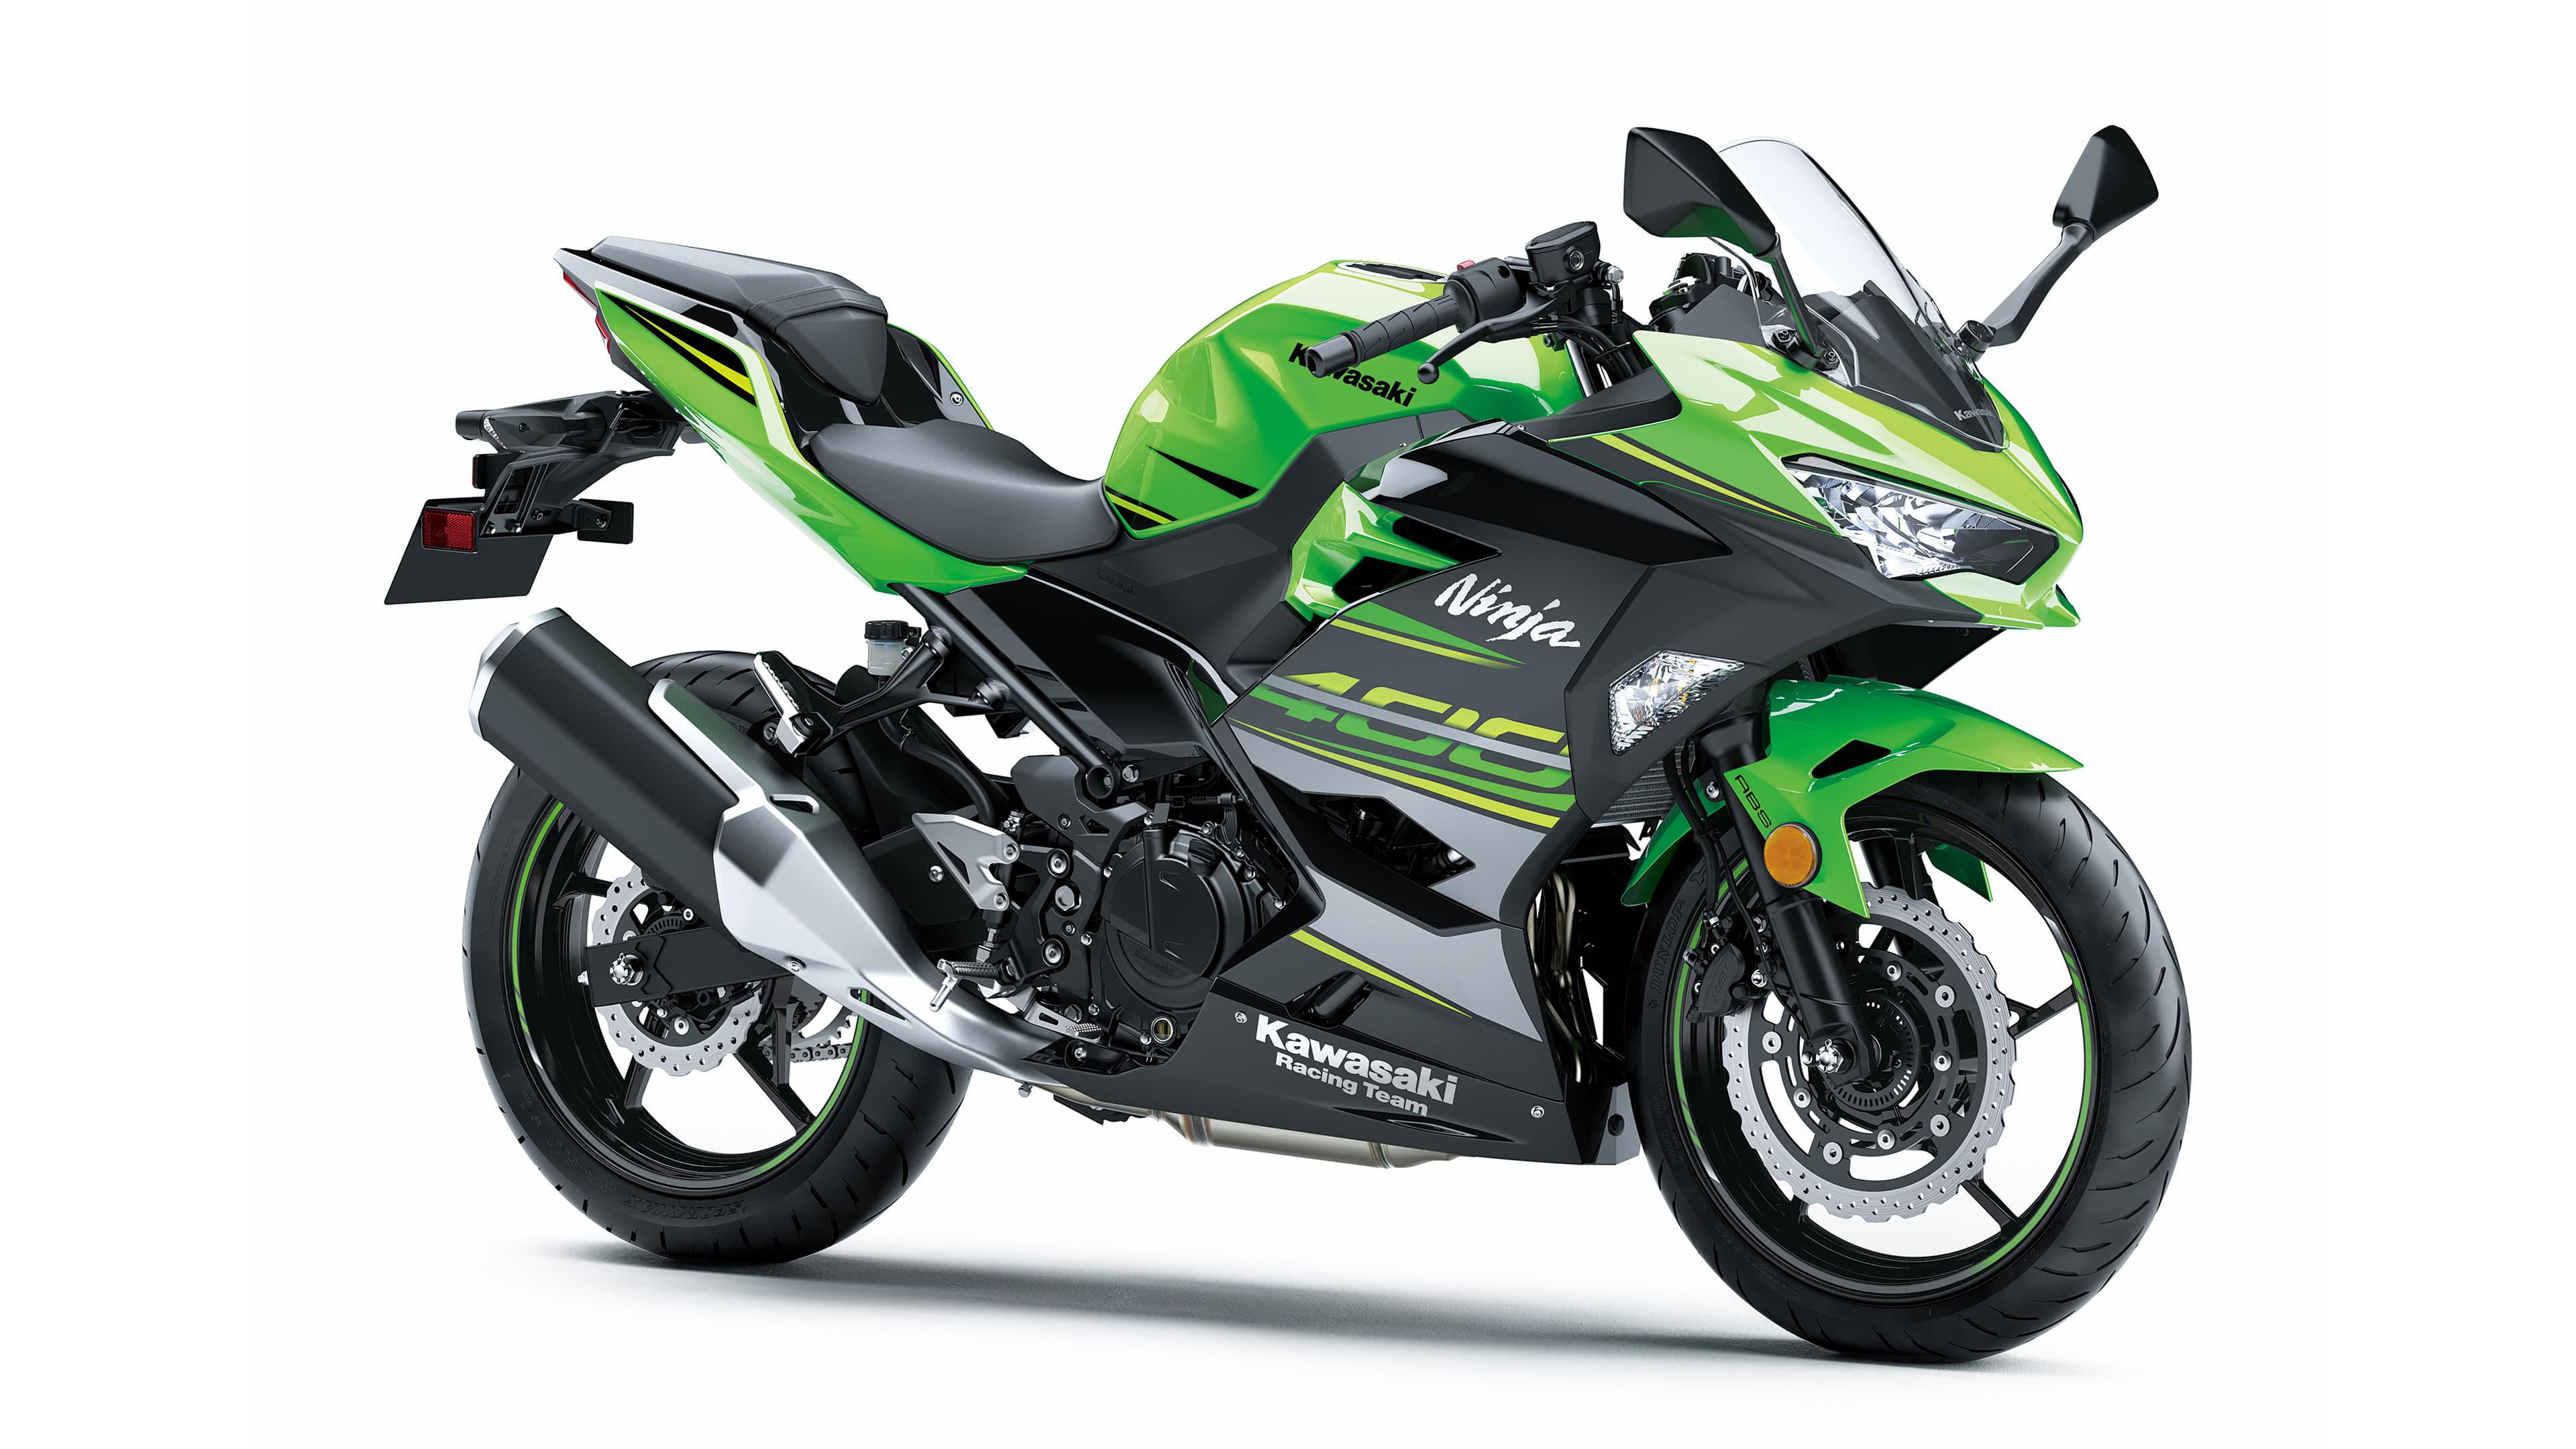 Kawasaki Ninja 400 ABS UHD 4K Wallpaper